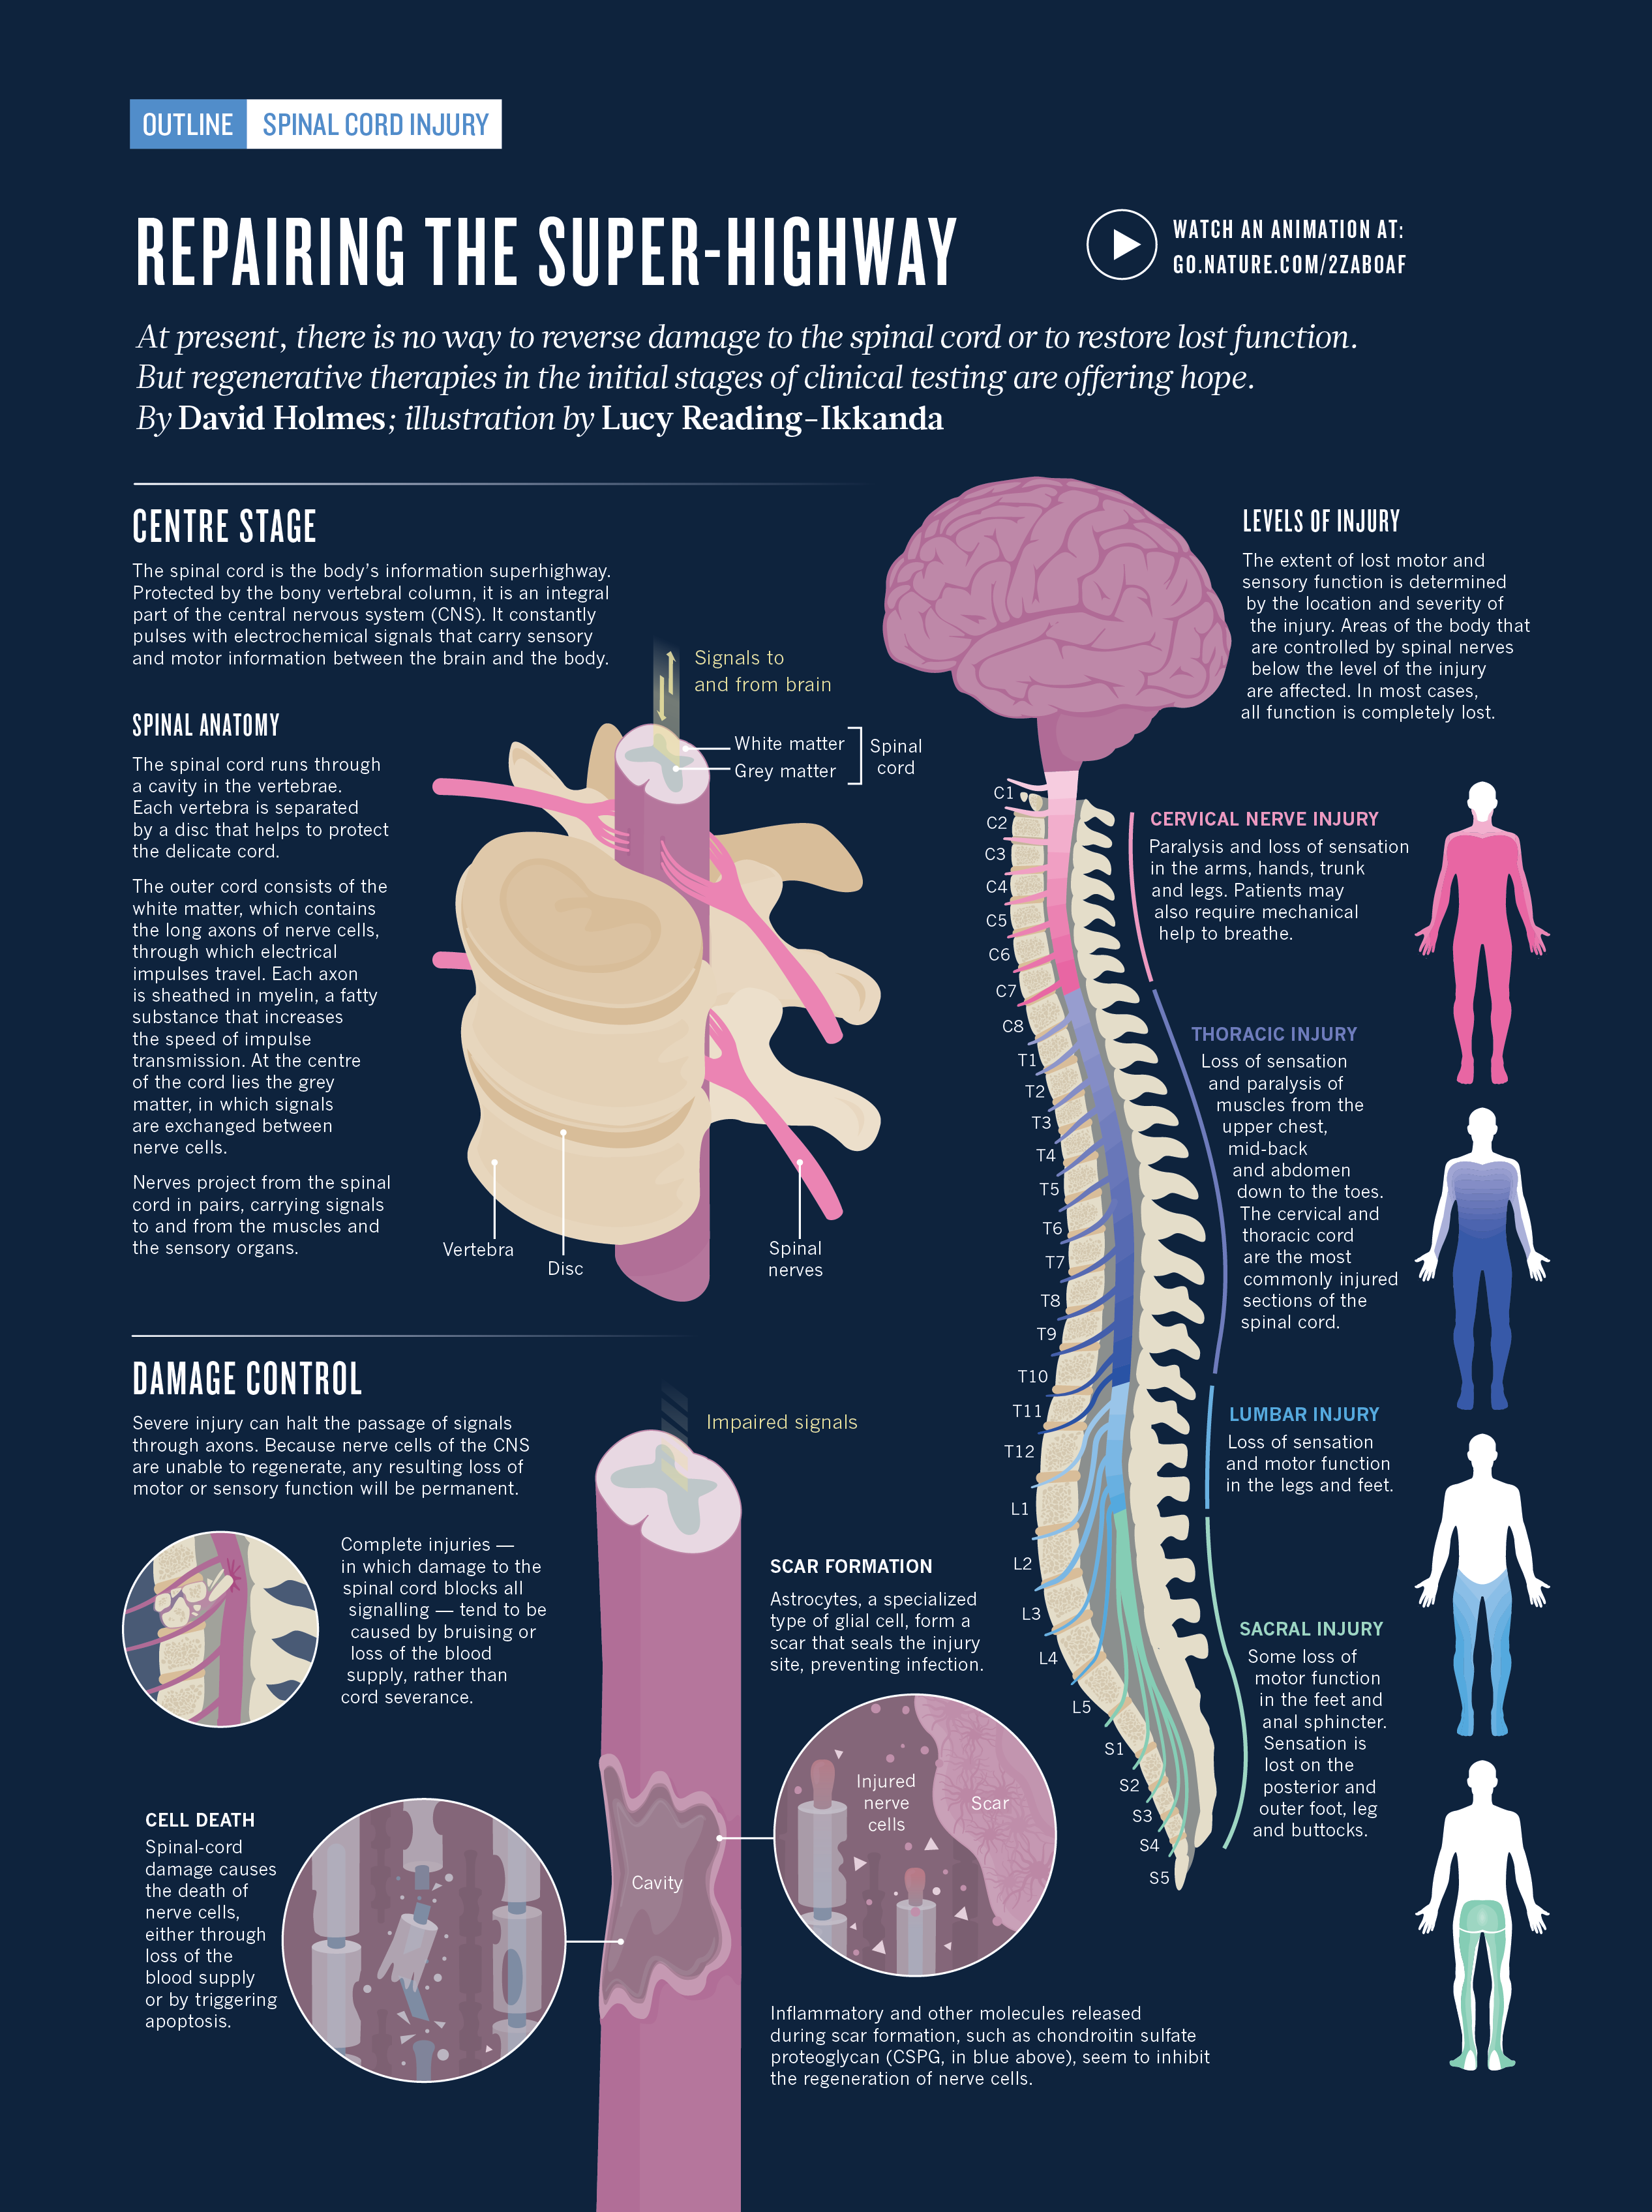 spinal cord injury patientsa - HD2533×3392